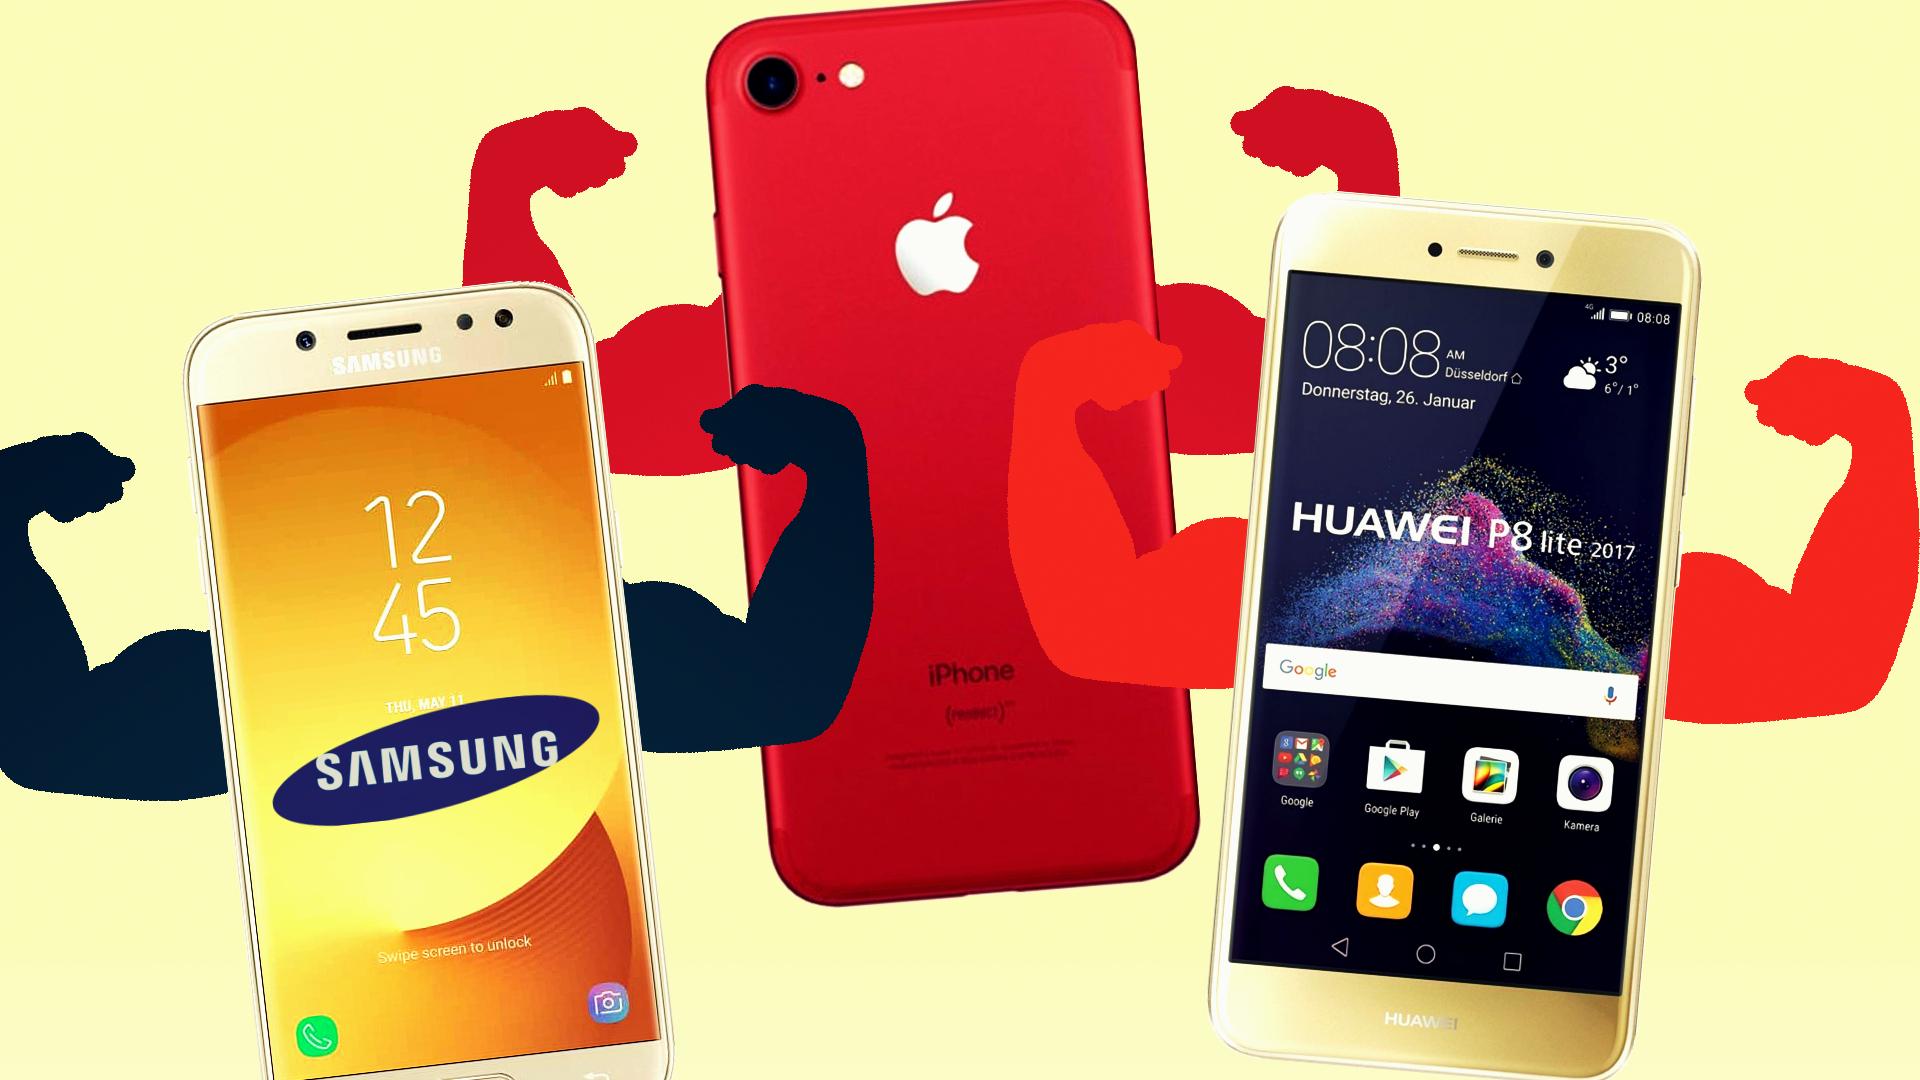 [WORK] Apple Dominates Global Smartphone Market But Samsung's Catching Up LuchaSmartphones2